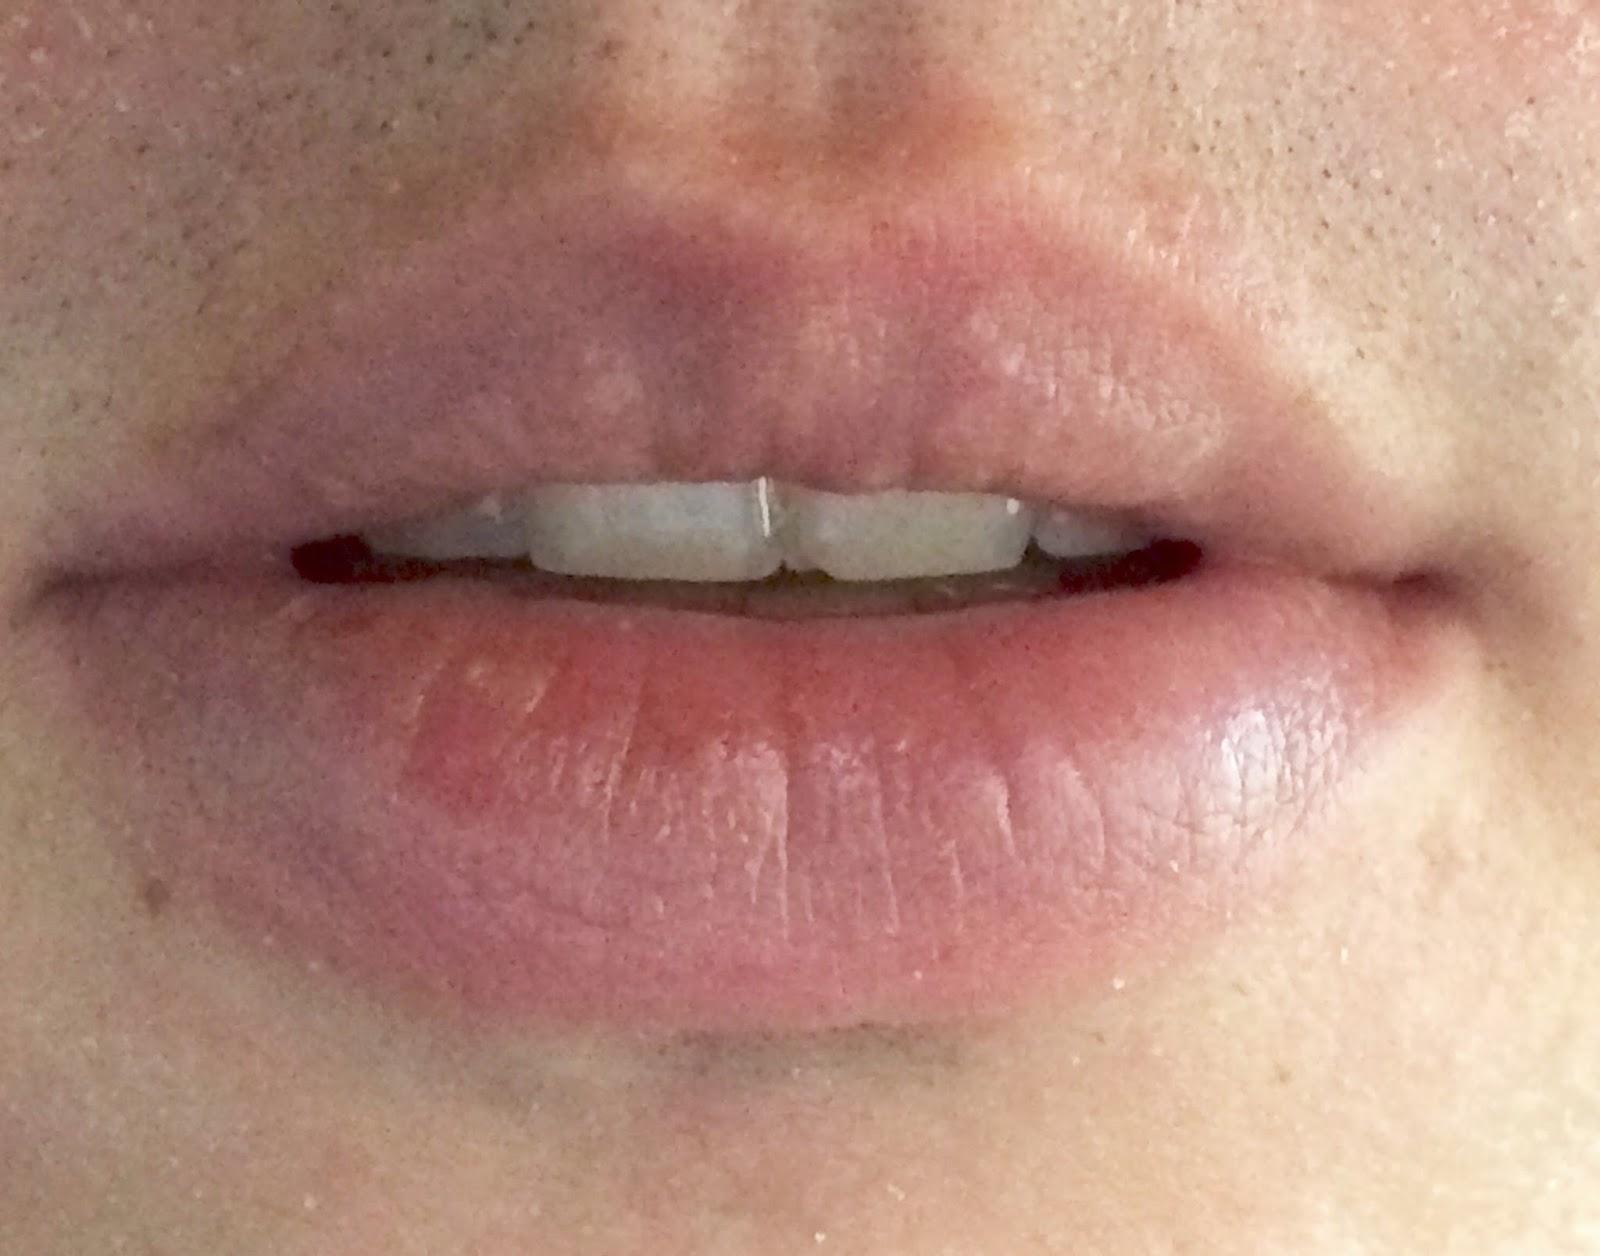 Exfoliative Cheilitis Blog: Lip status and treatment routine